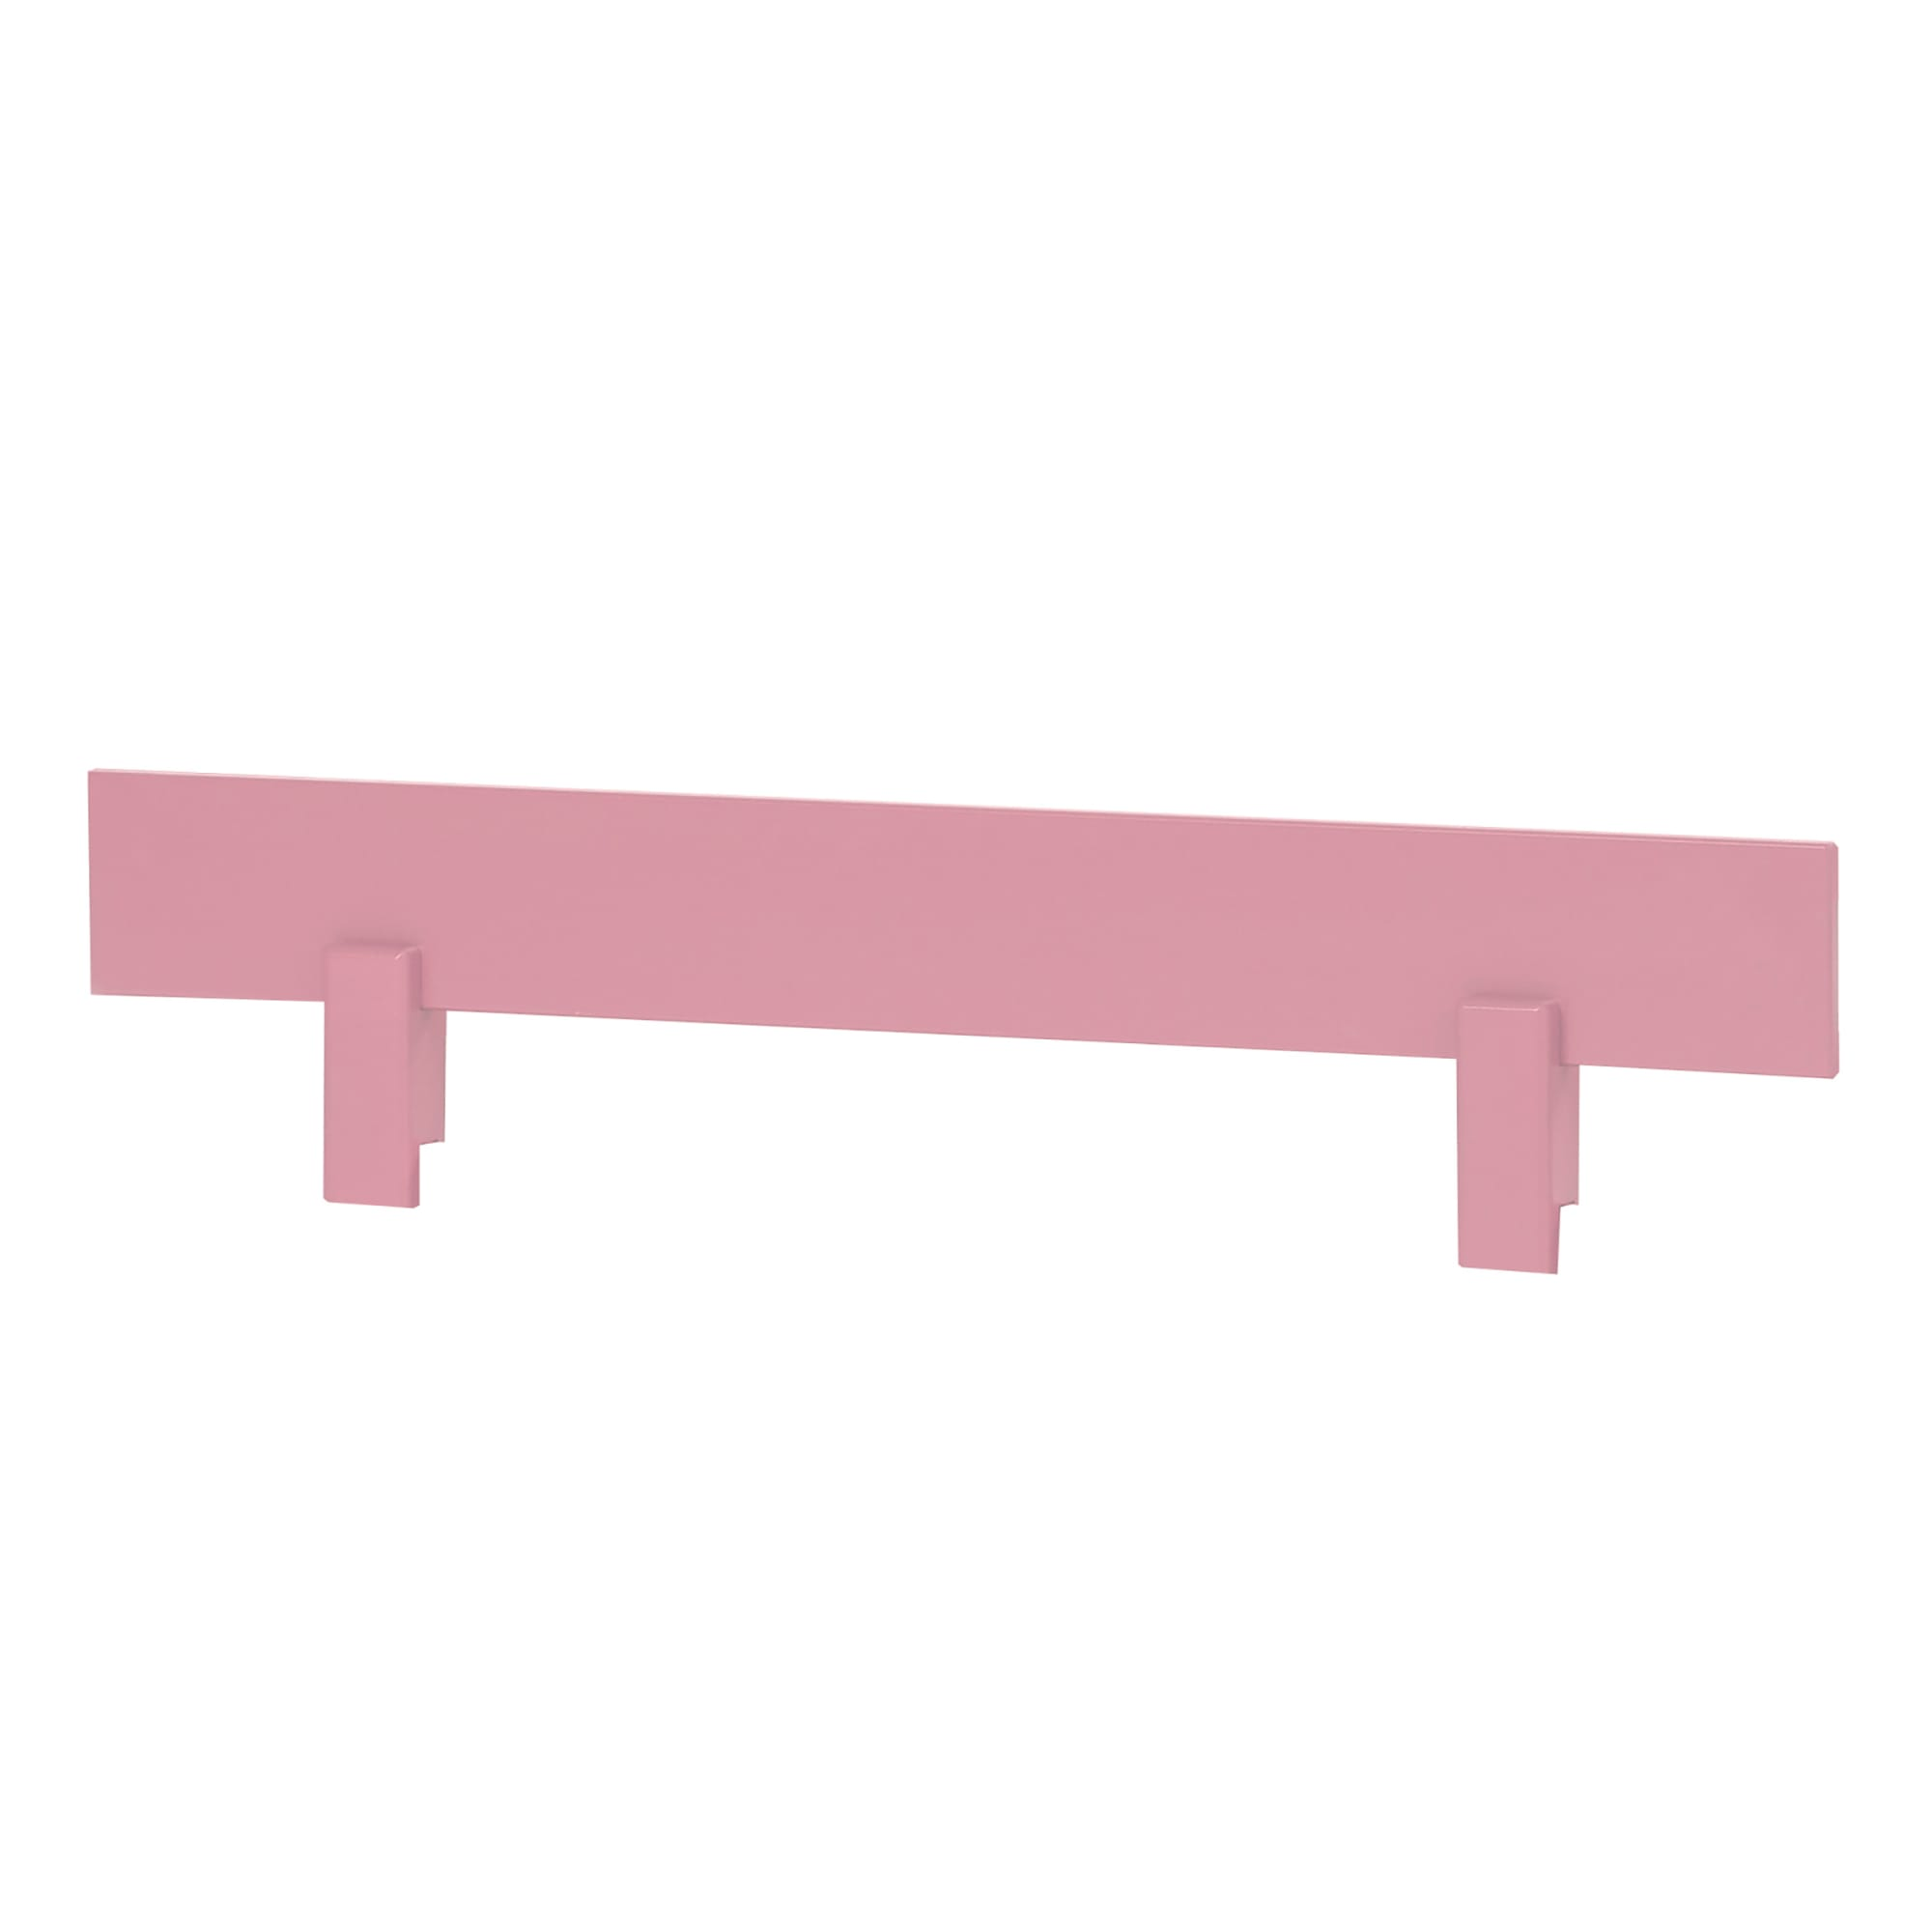 Hoppekids - IDA-MARIE Safety Board - Pale Rose